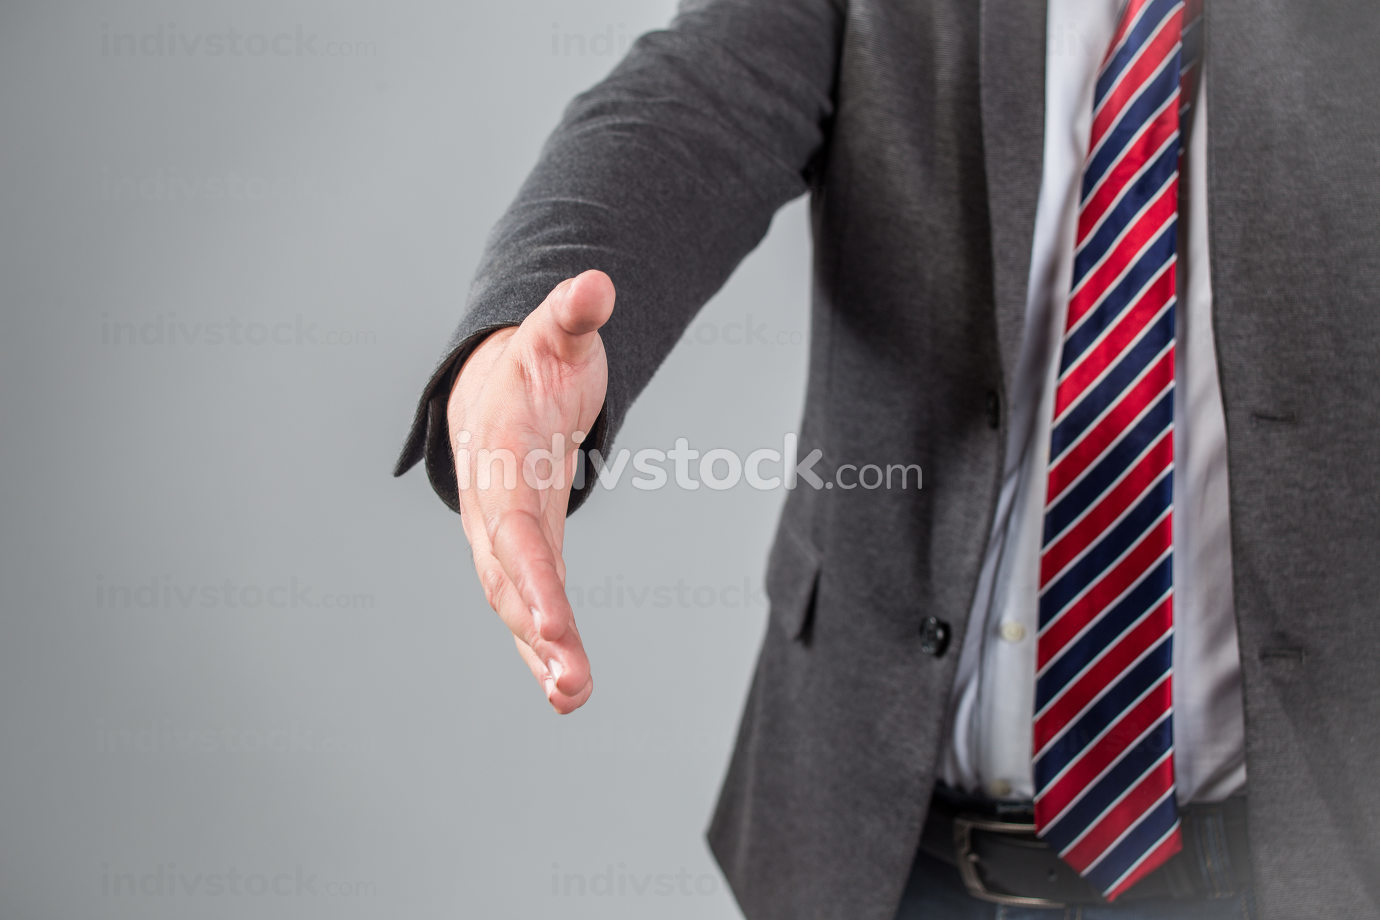 a man gives a hand toward to the camera